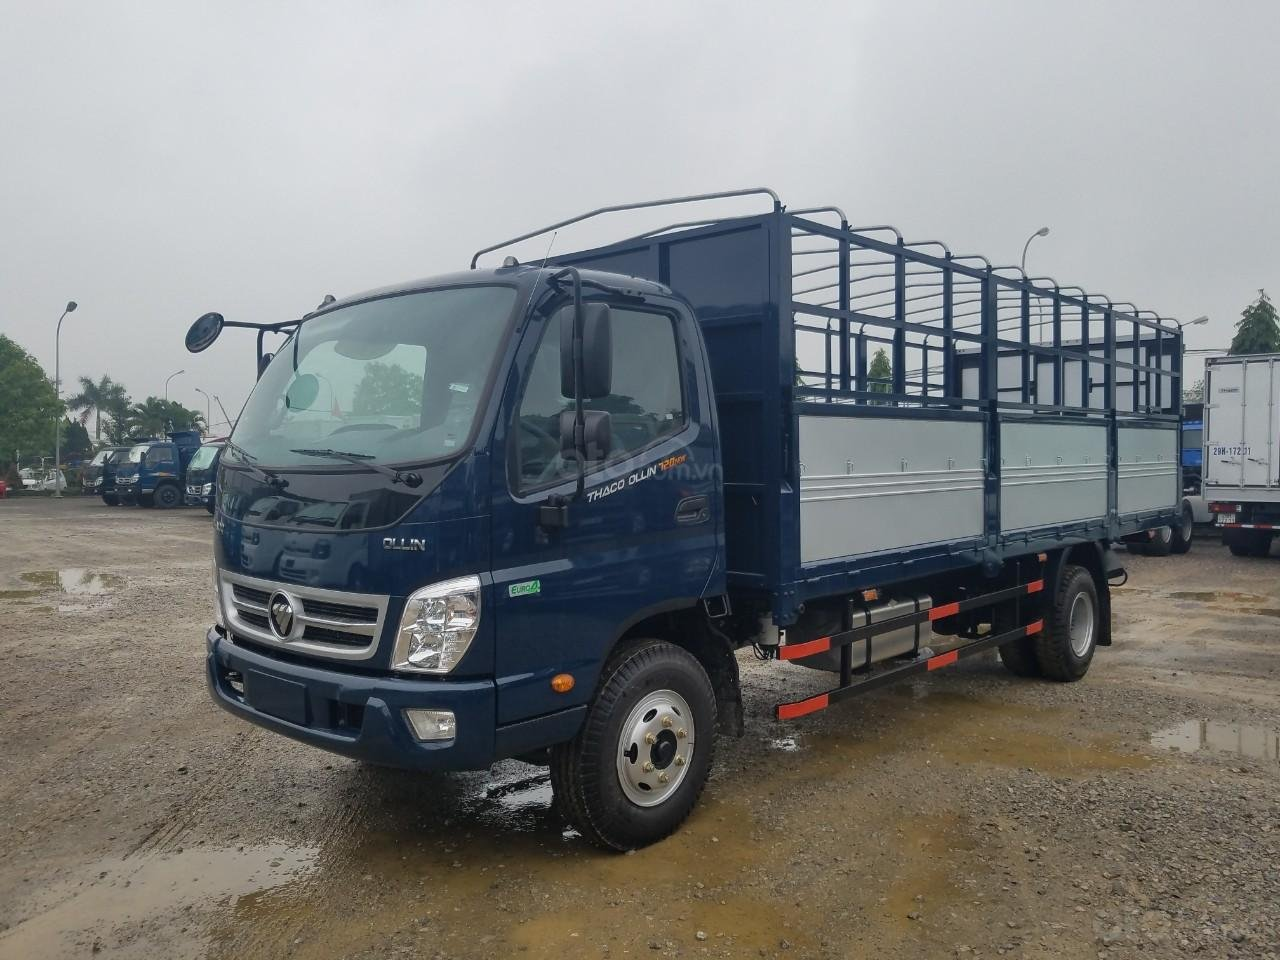 Bán xe tải Thaco OLLIN 720 E4 trọng tải 7 tấn 2019 (1)